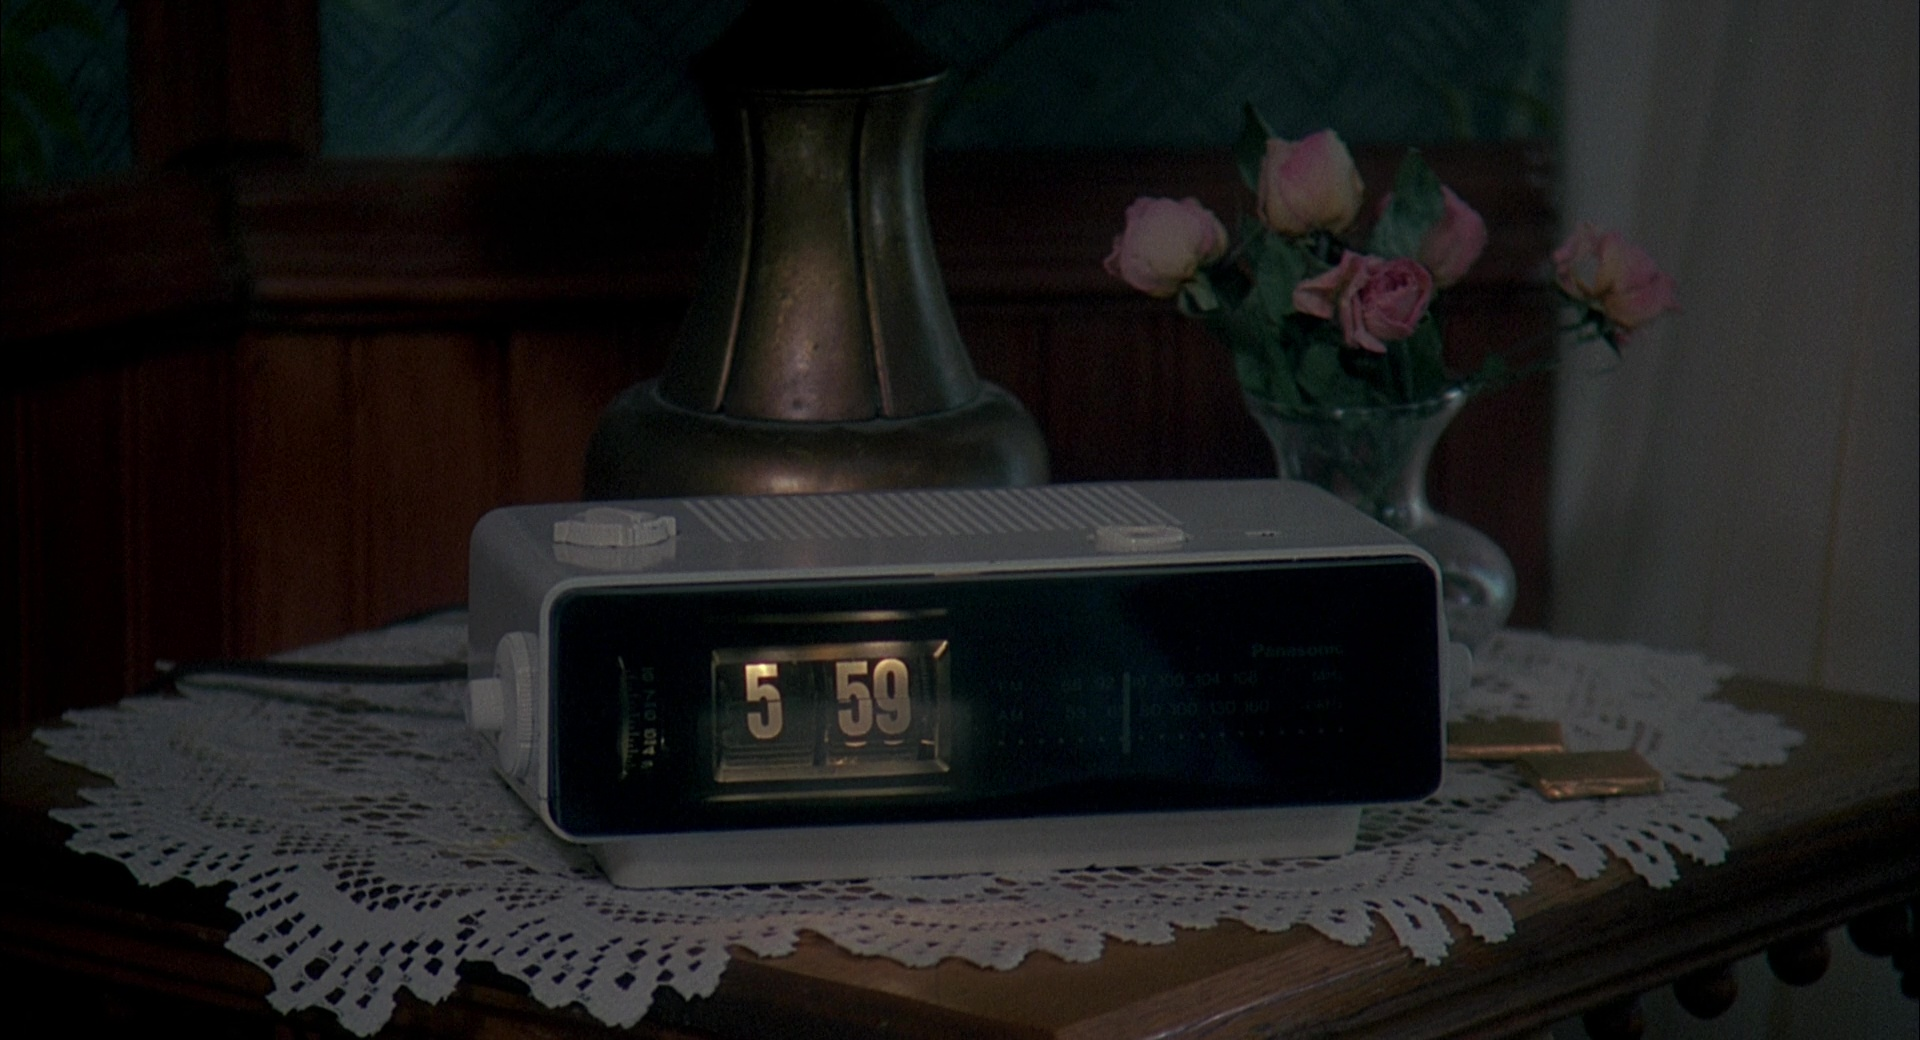 Panasonic Rc 6025 Alarm Radio Clock Used By Bill Murray